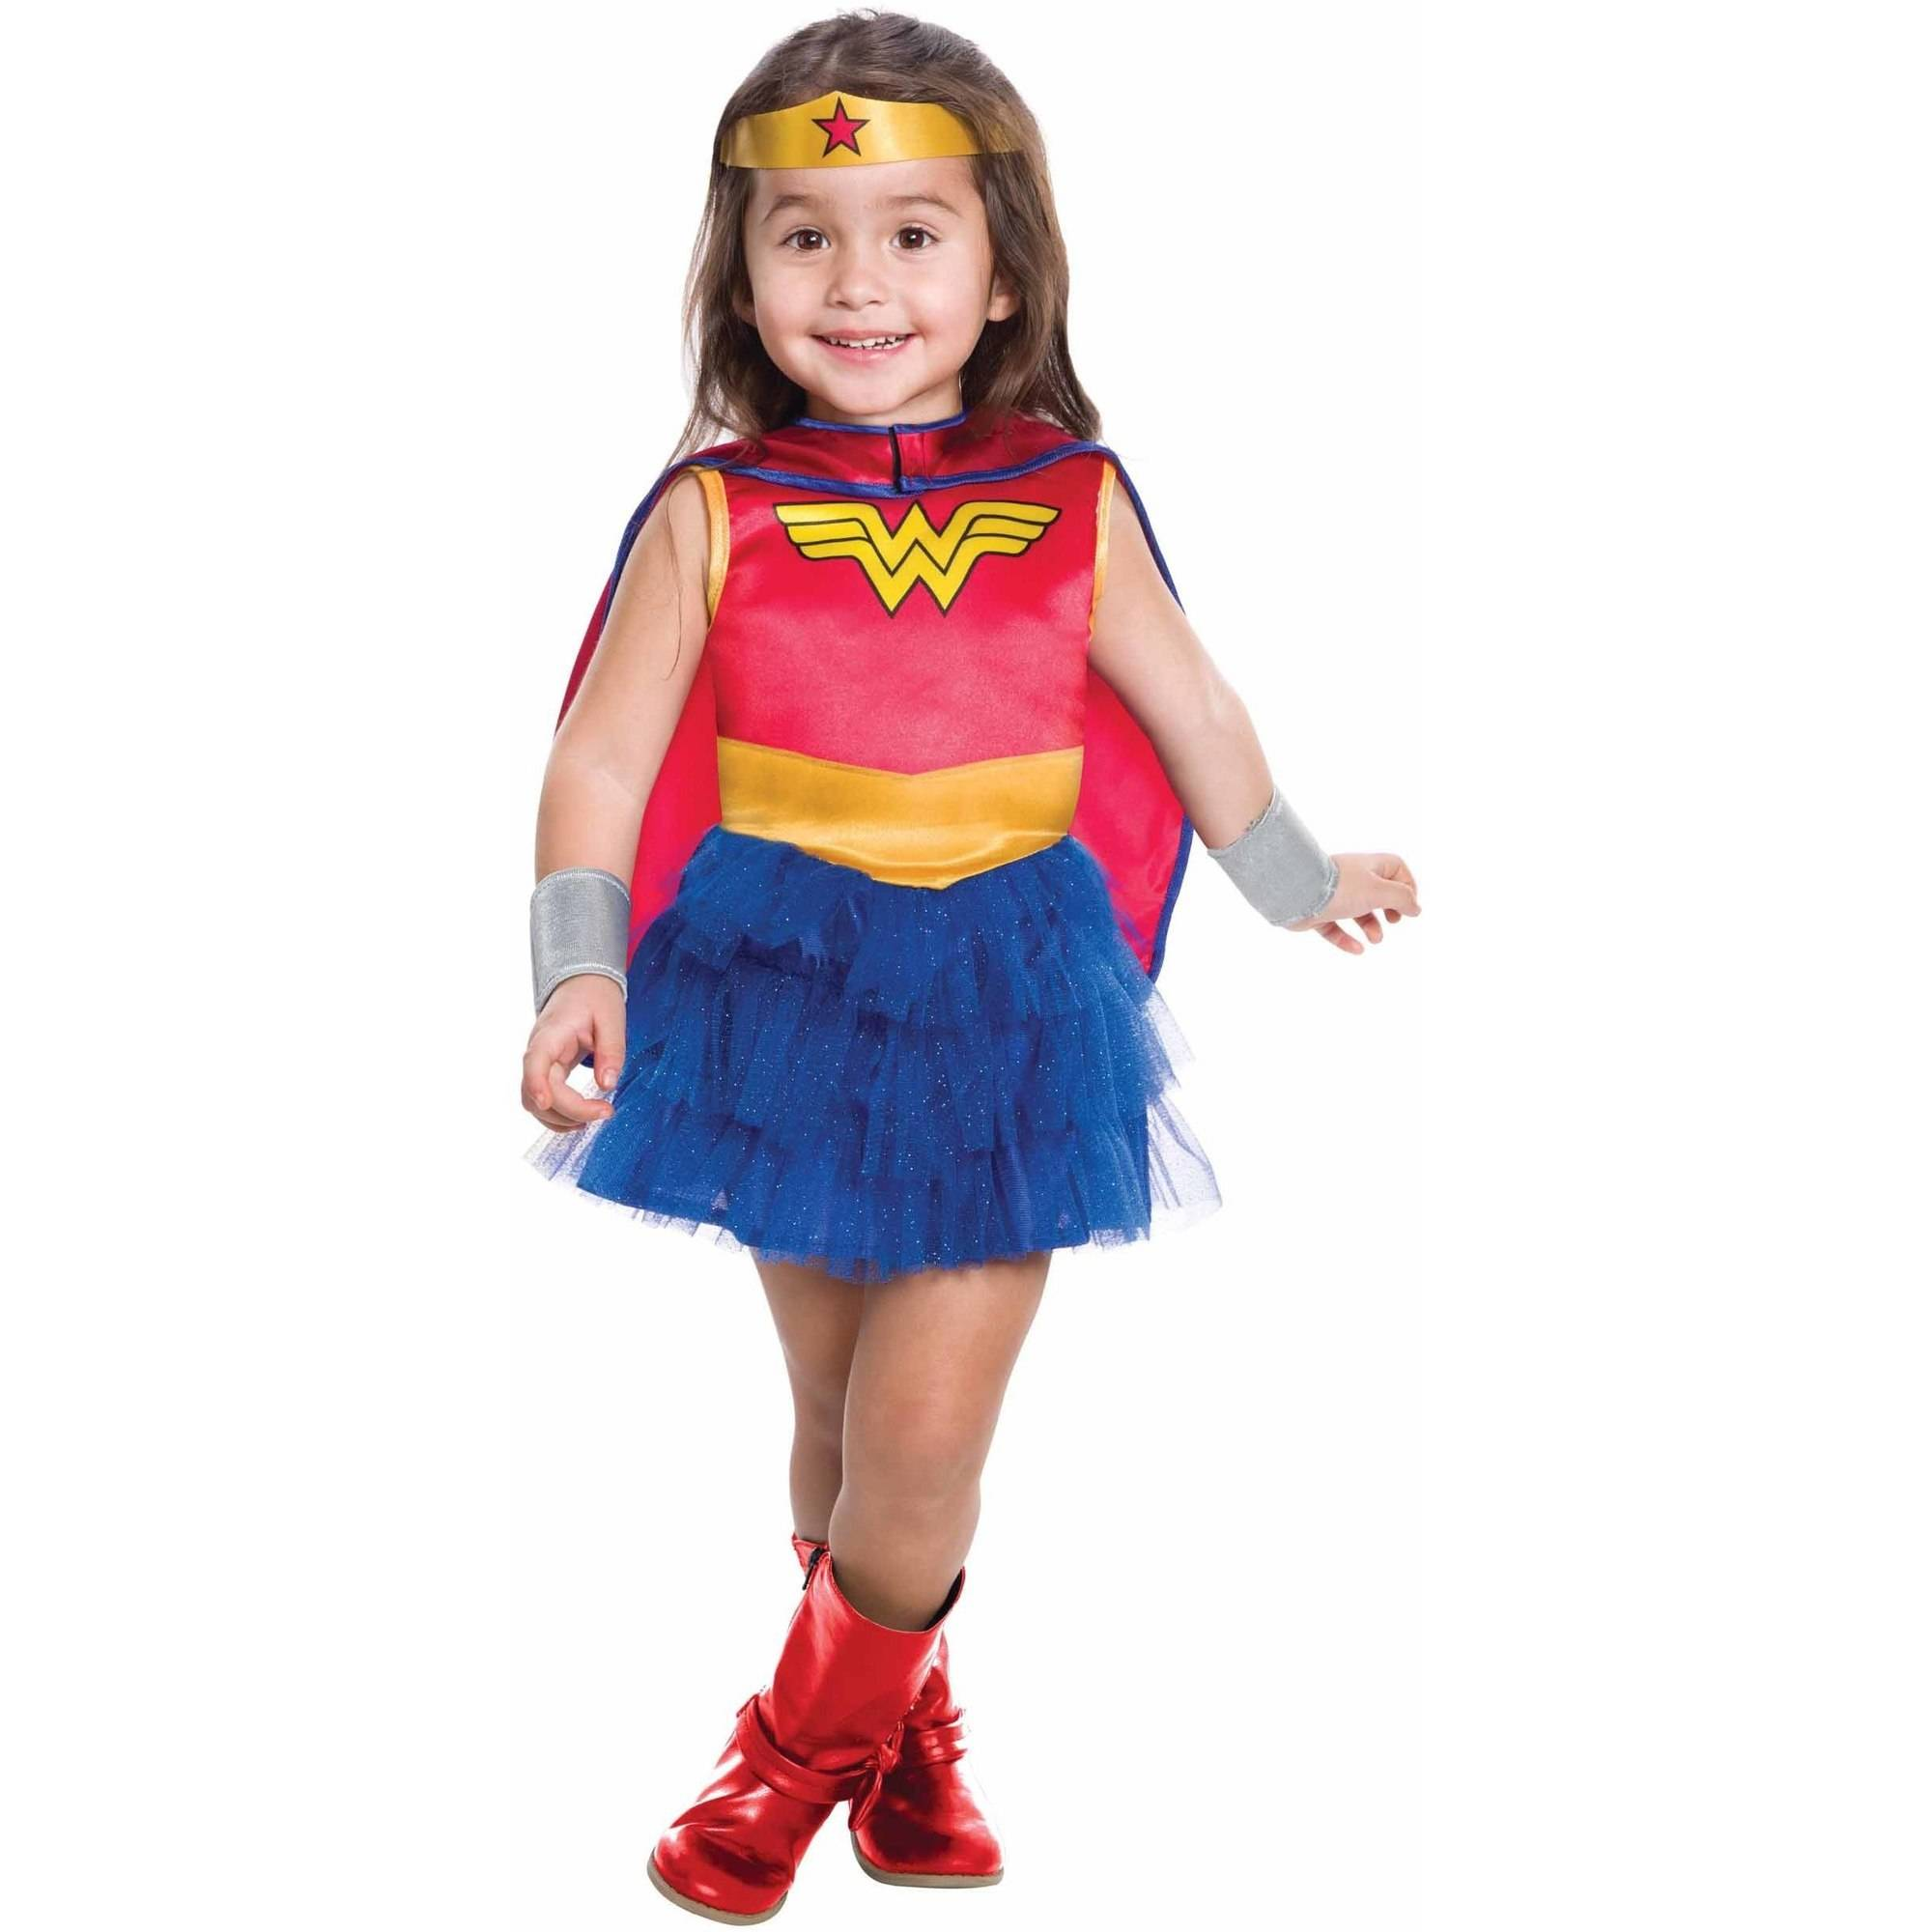 Wonder Woman Tutu Toddler's Costume, 3T-4T